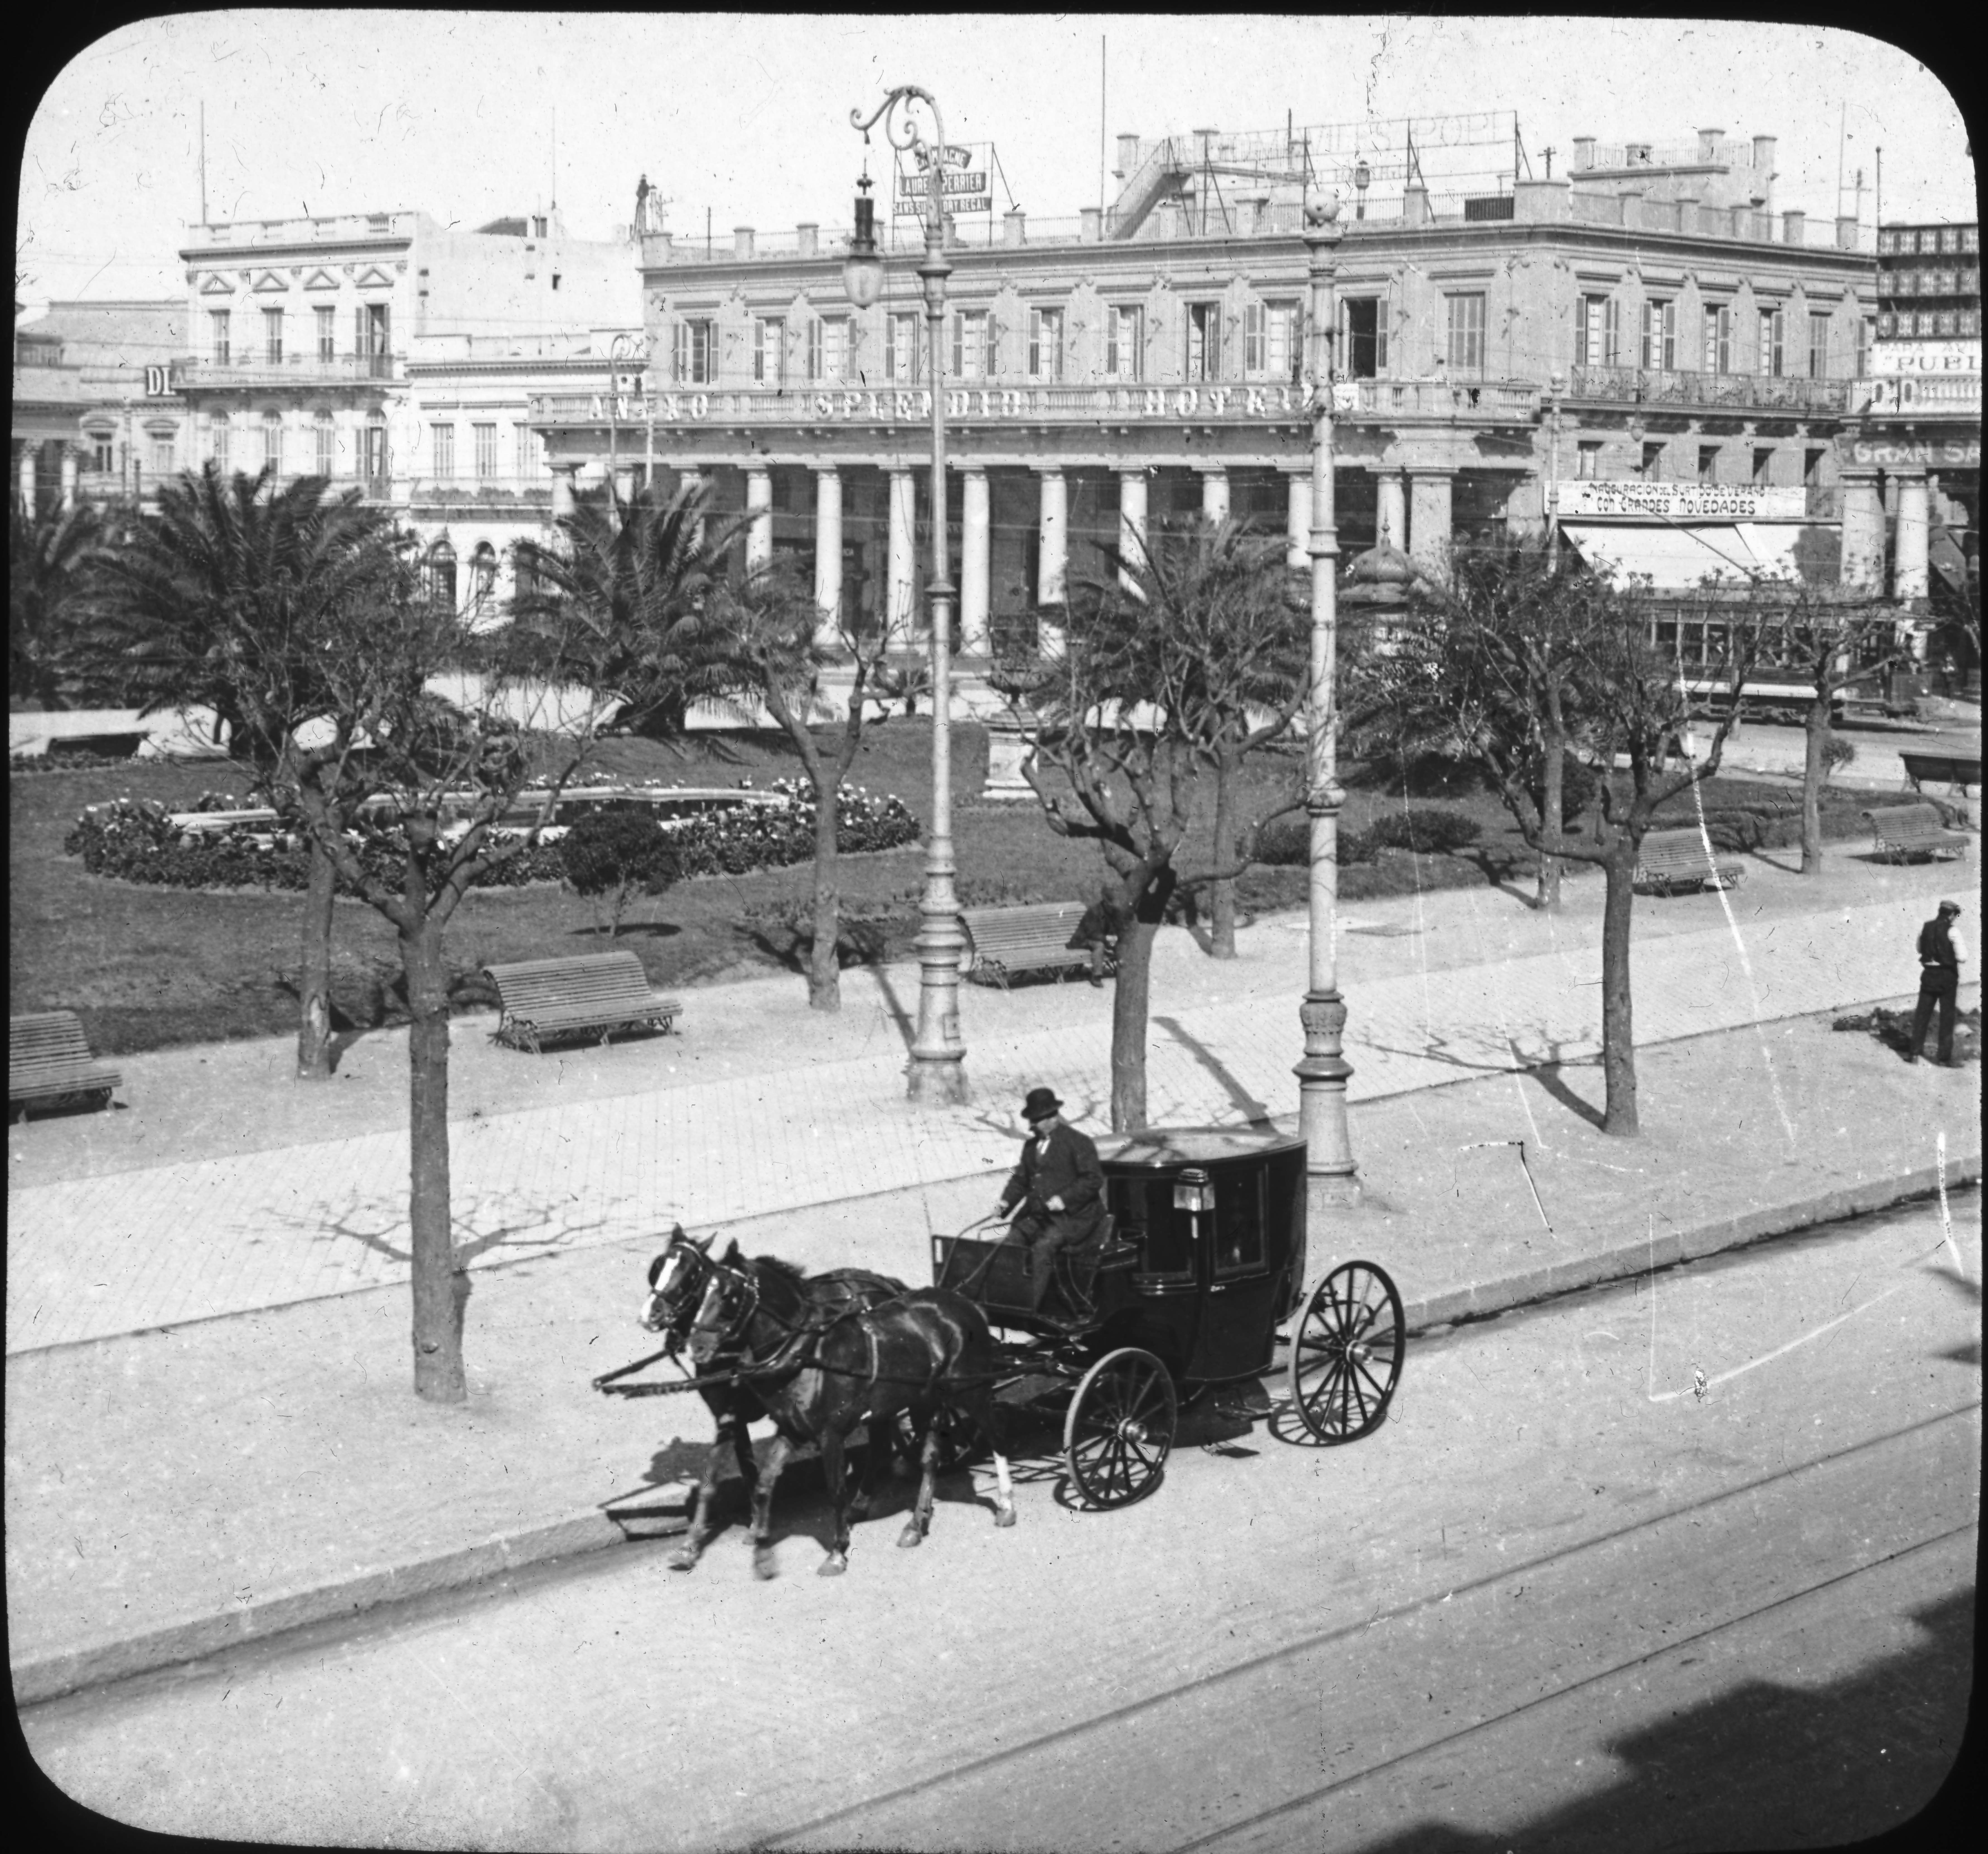 Plaza Independencia, Montevideo, Uruguay, S. America.